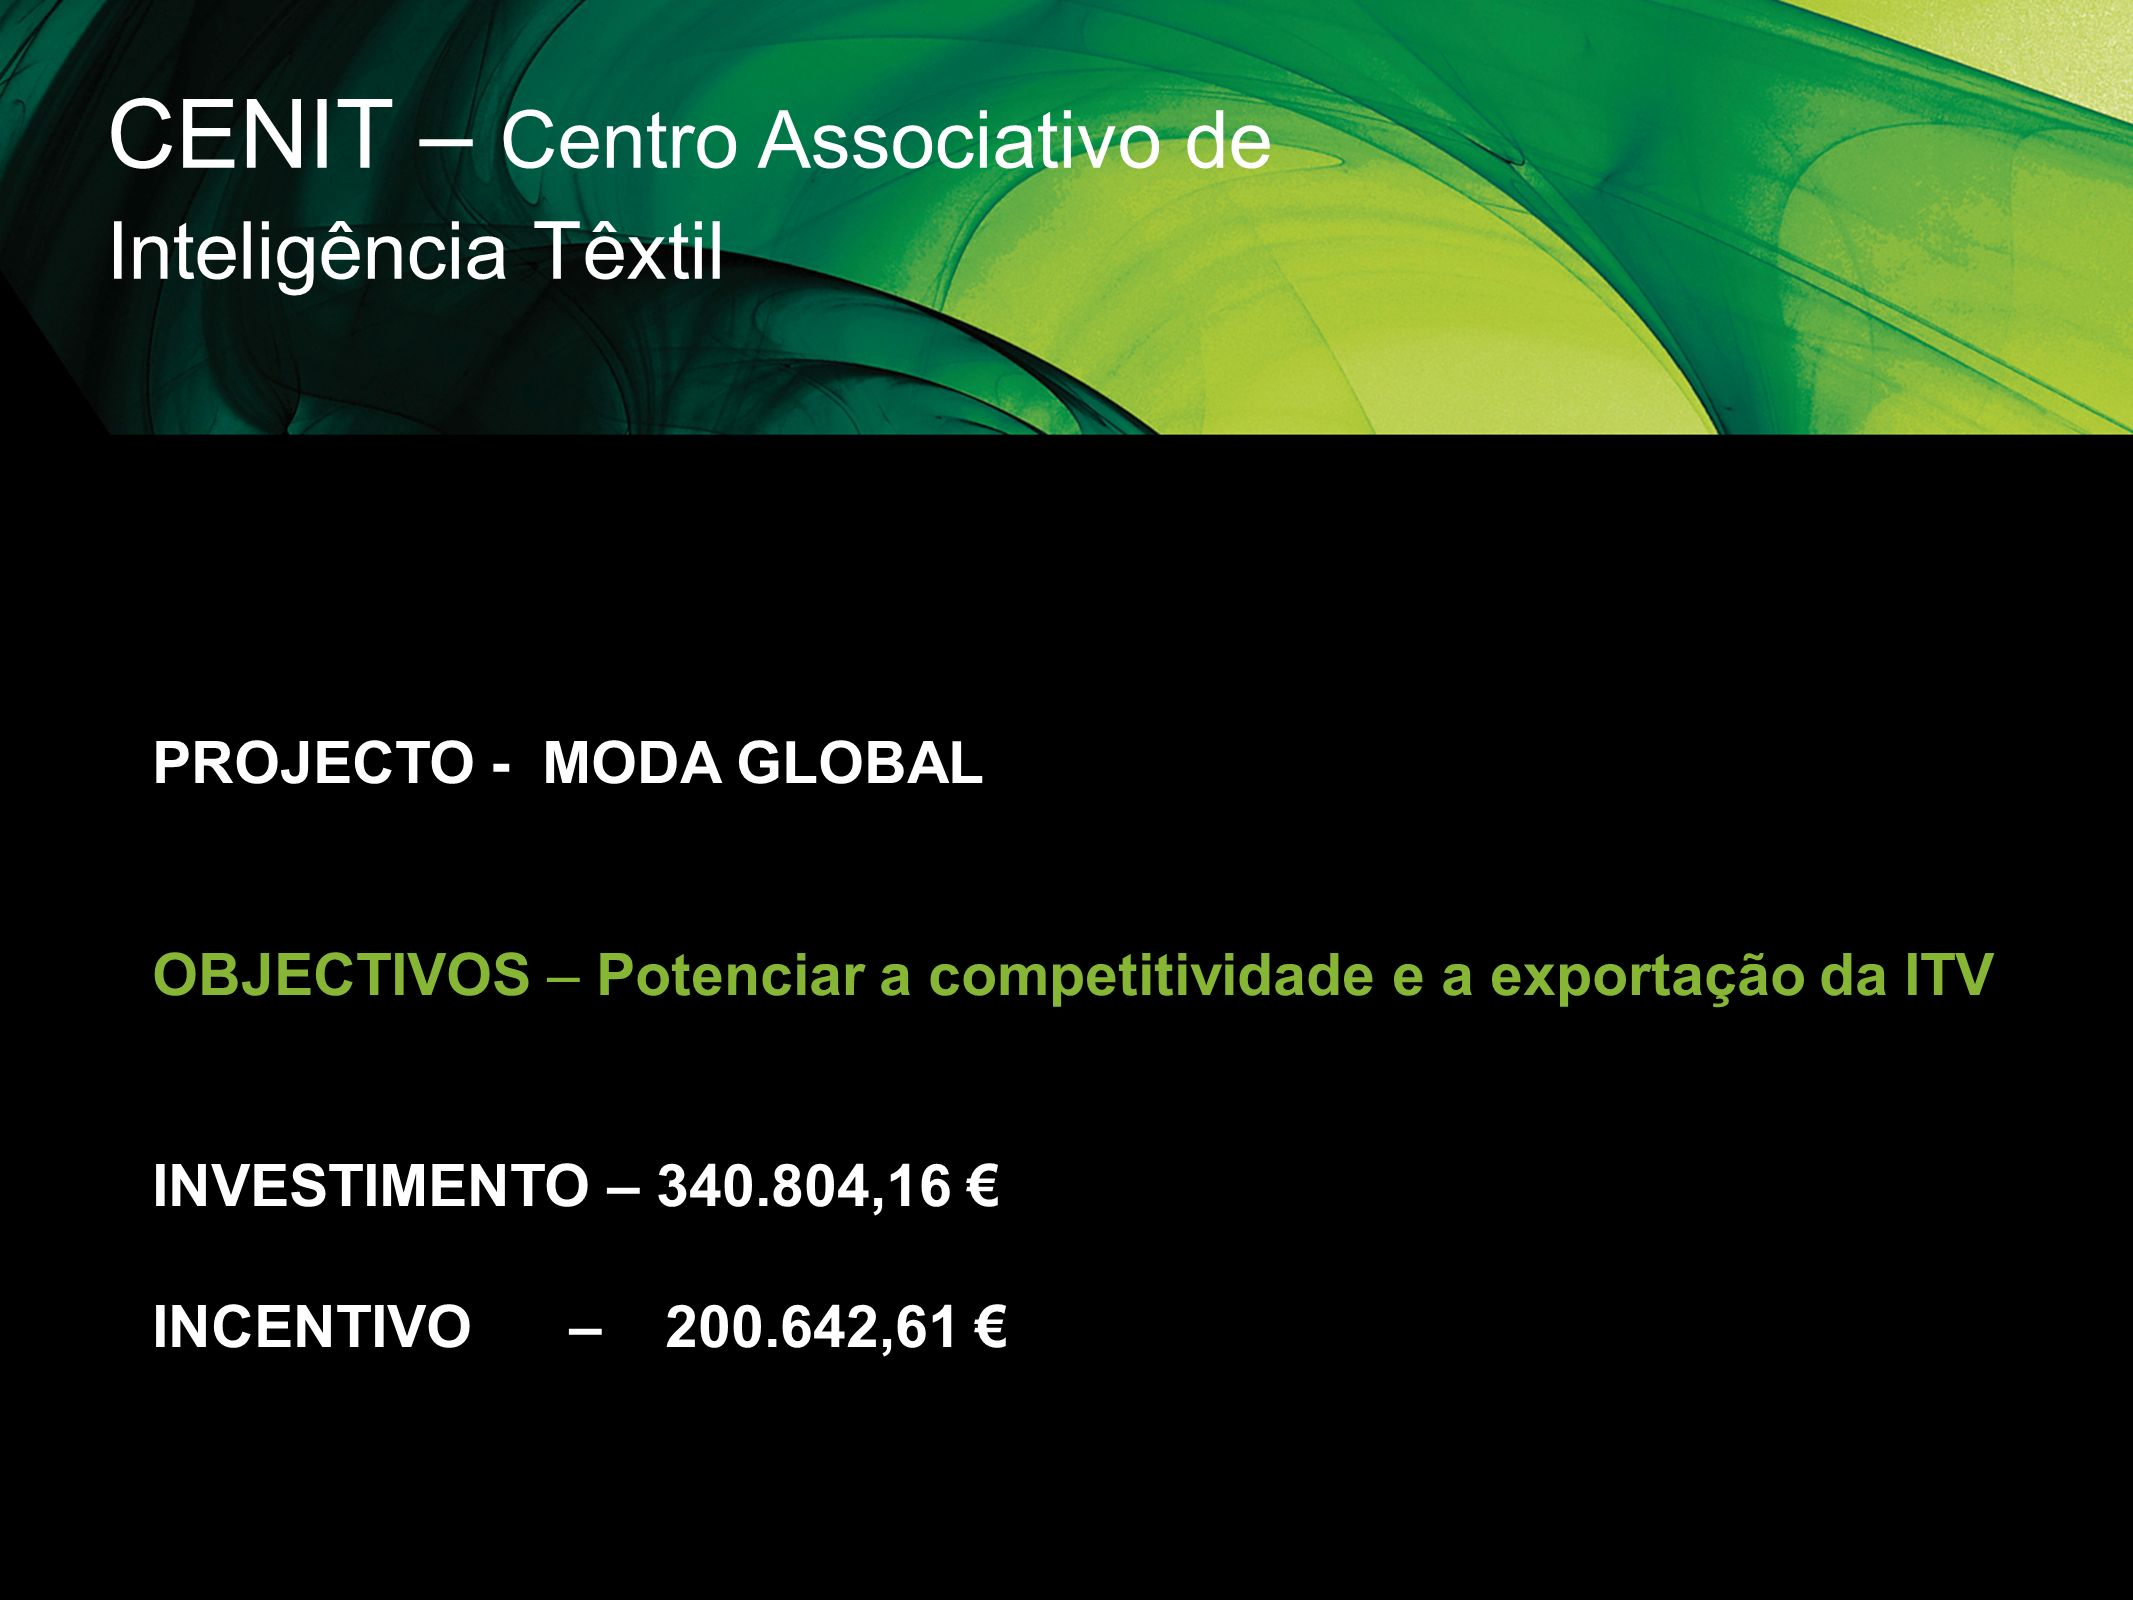 CENIT – Centro Associativo de Inteligência Têxtil